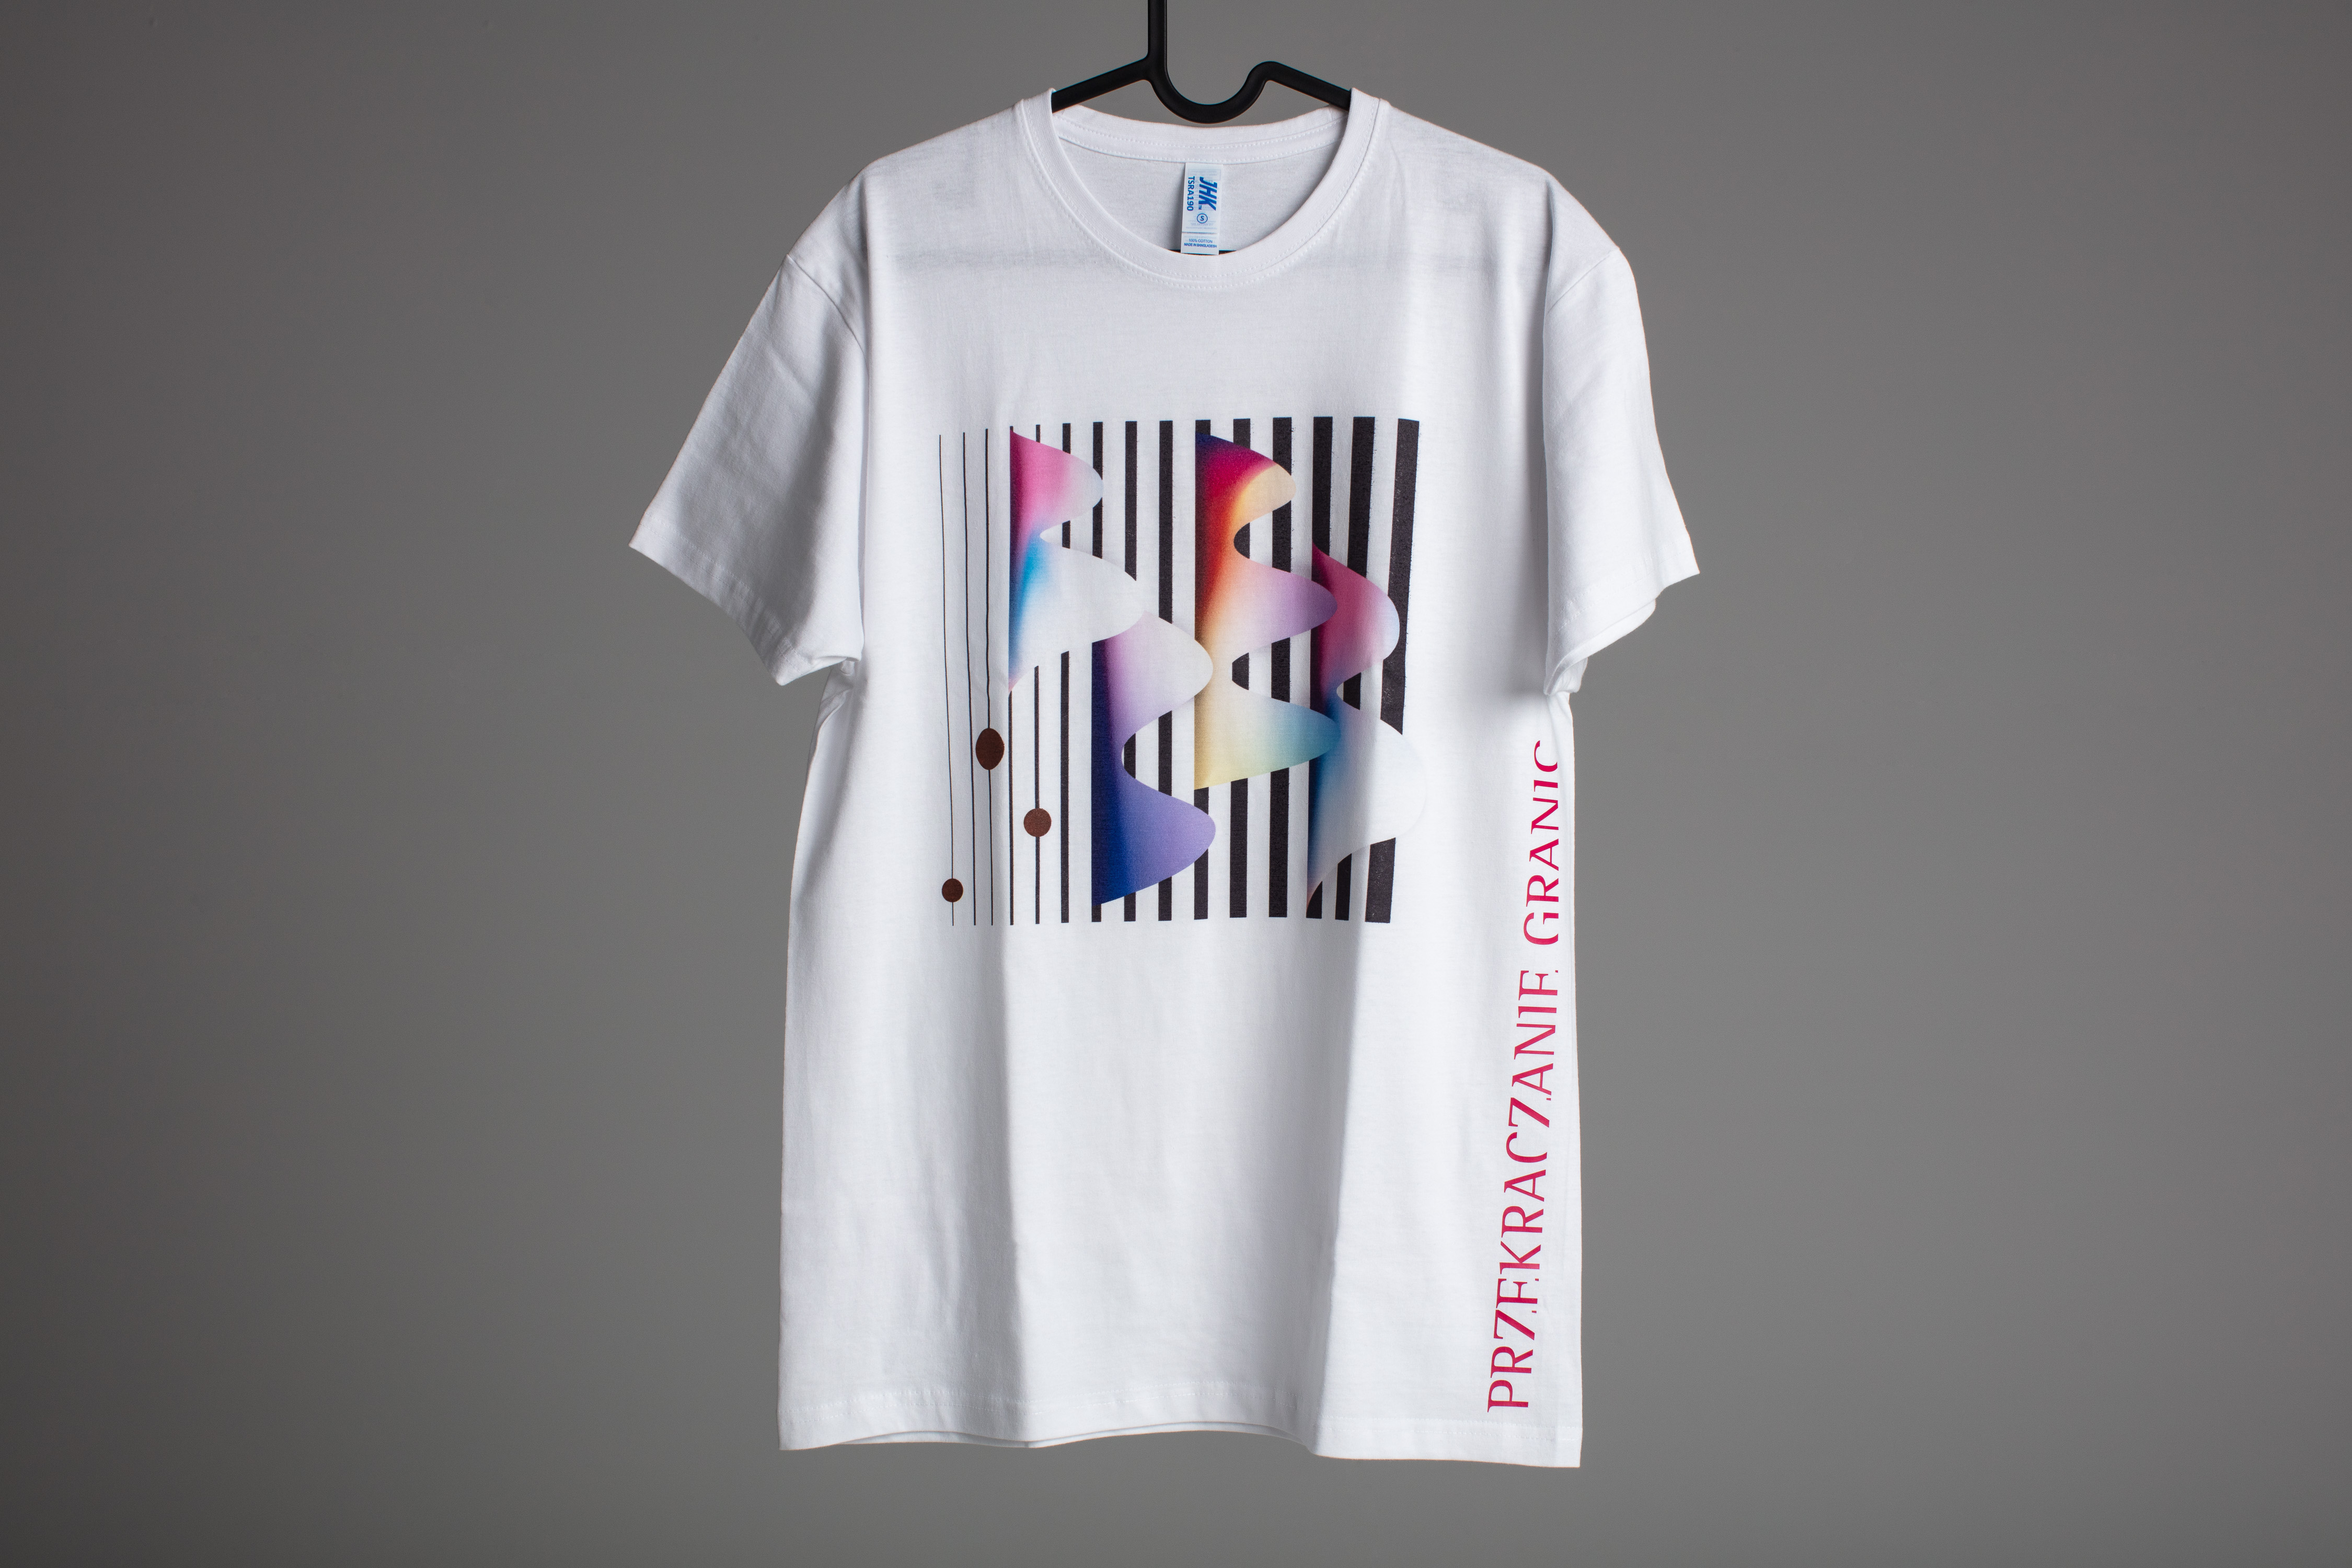 56. MFWC - t-shirt